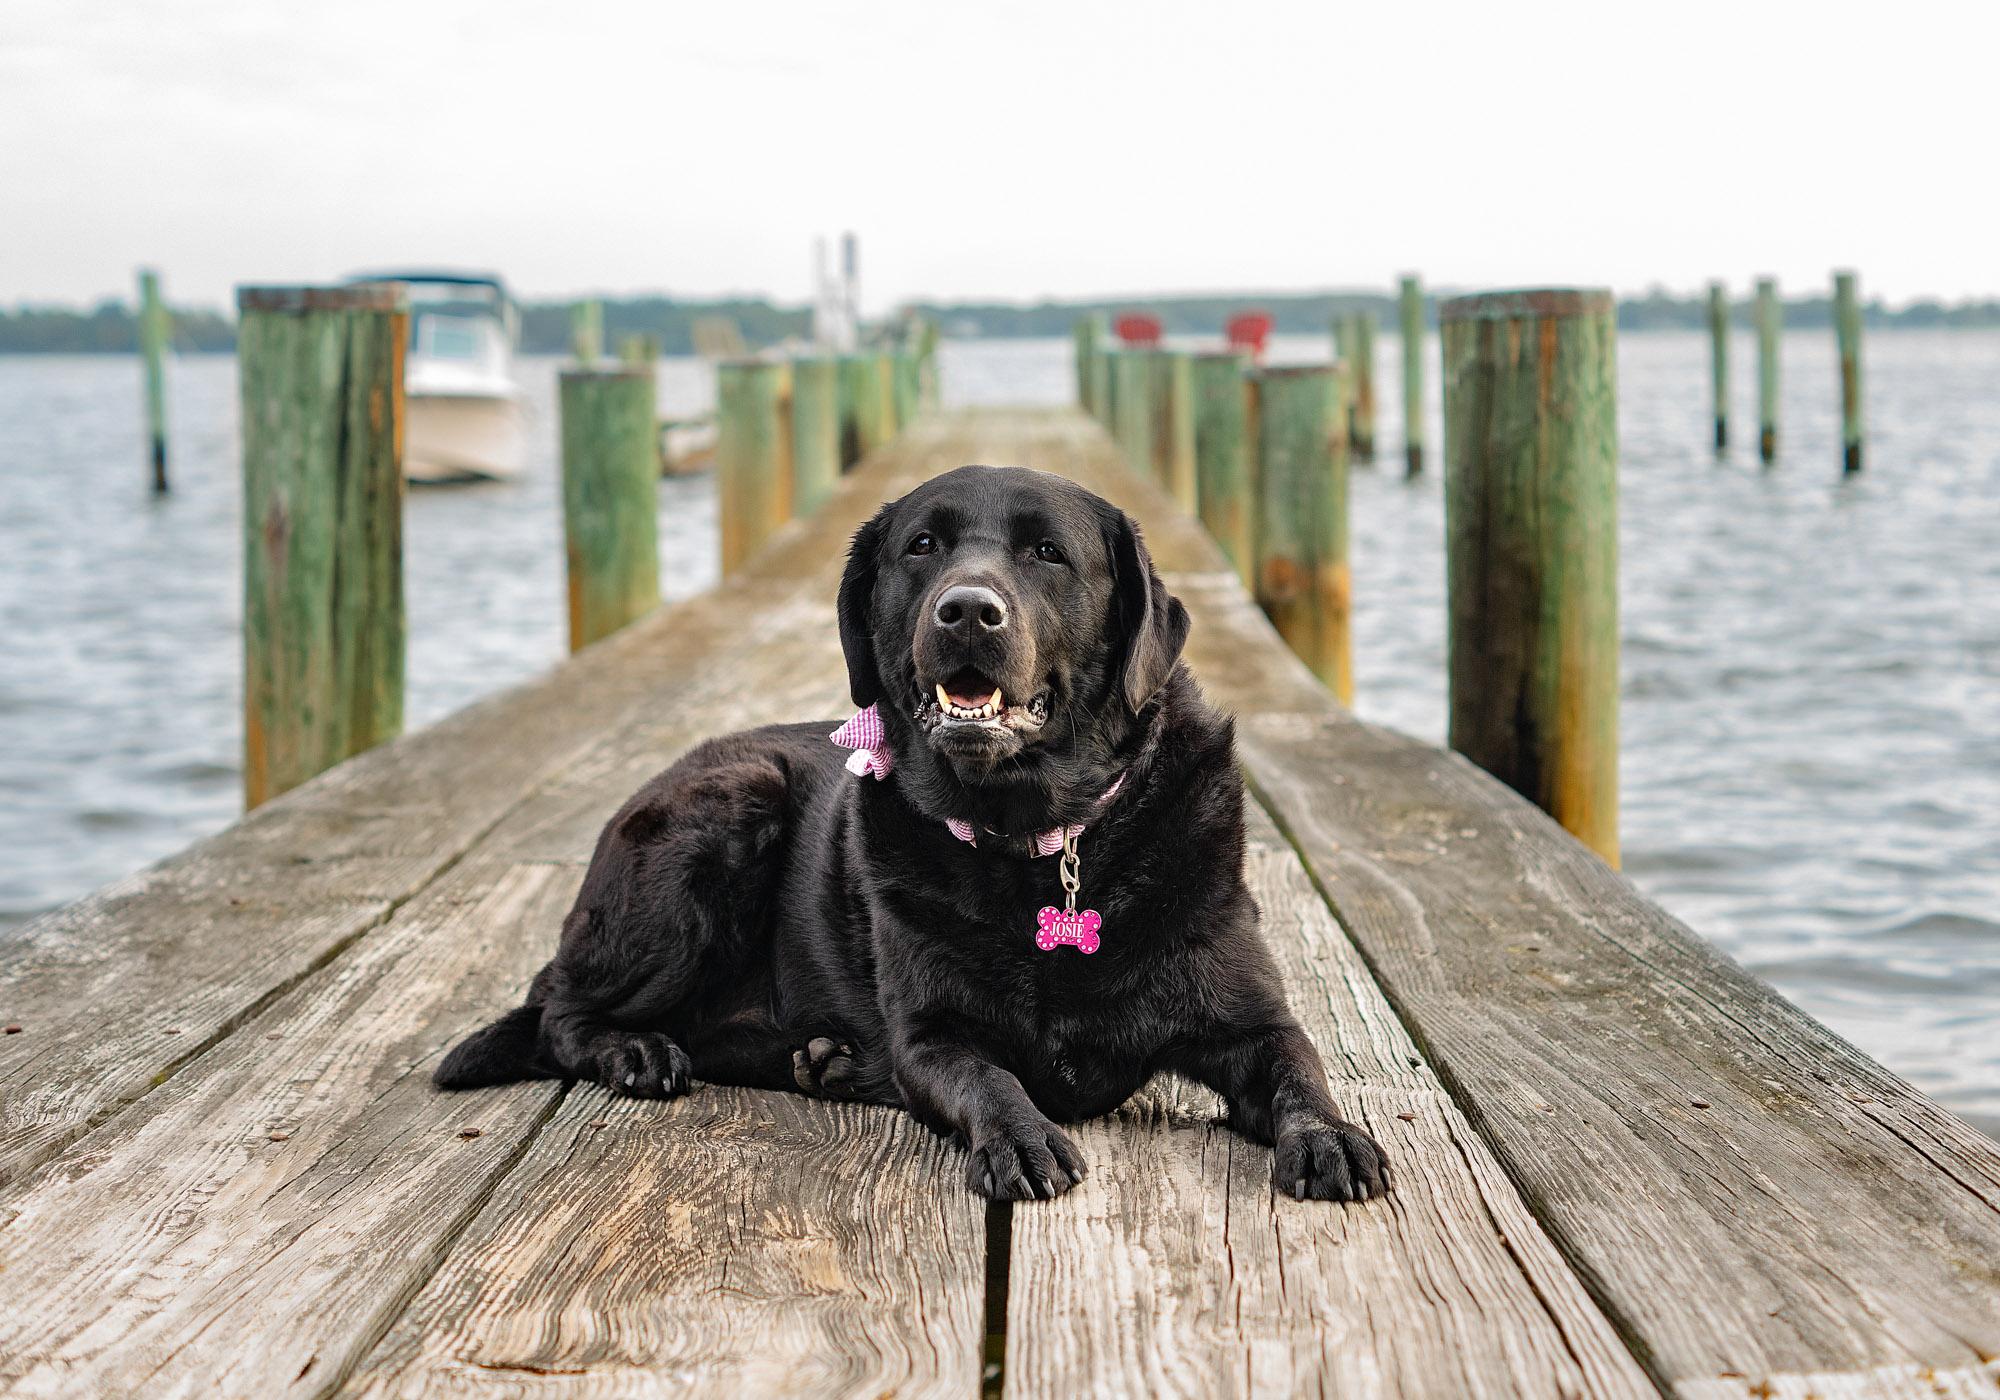 Black Lab - Dog on the dock - Pet Photographer